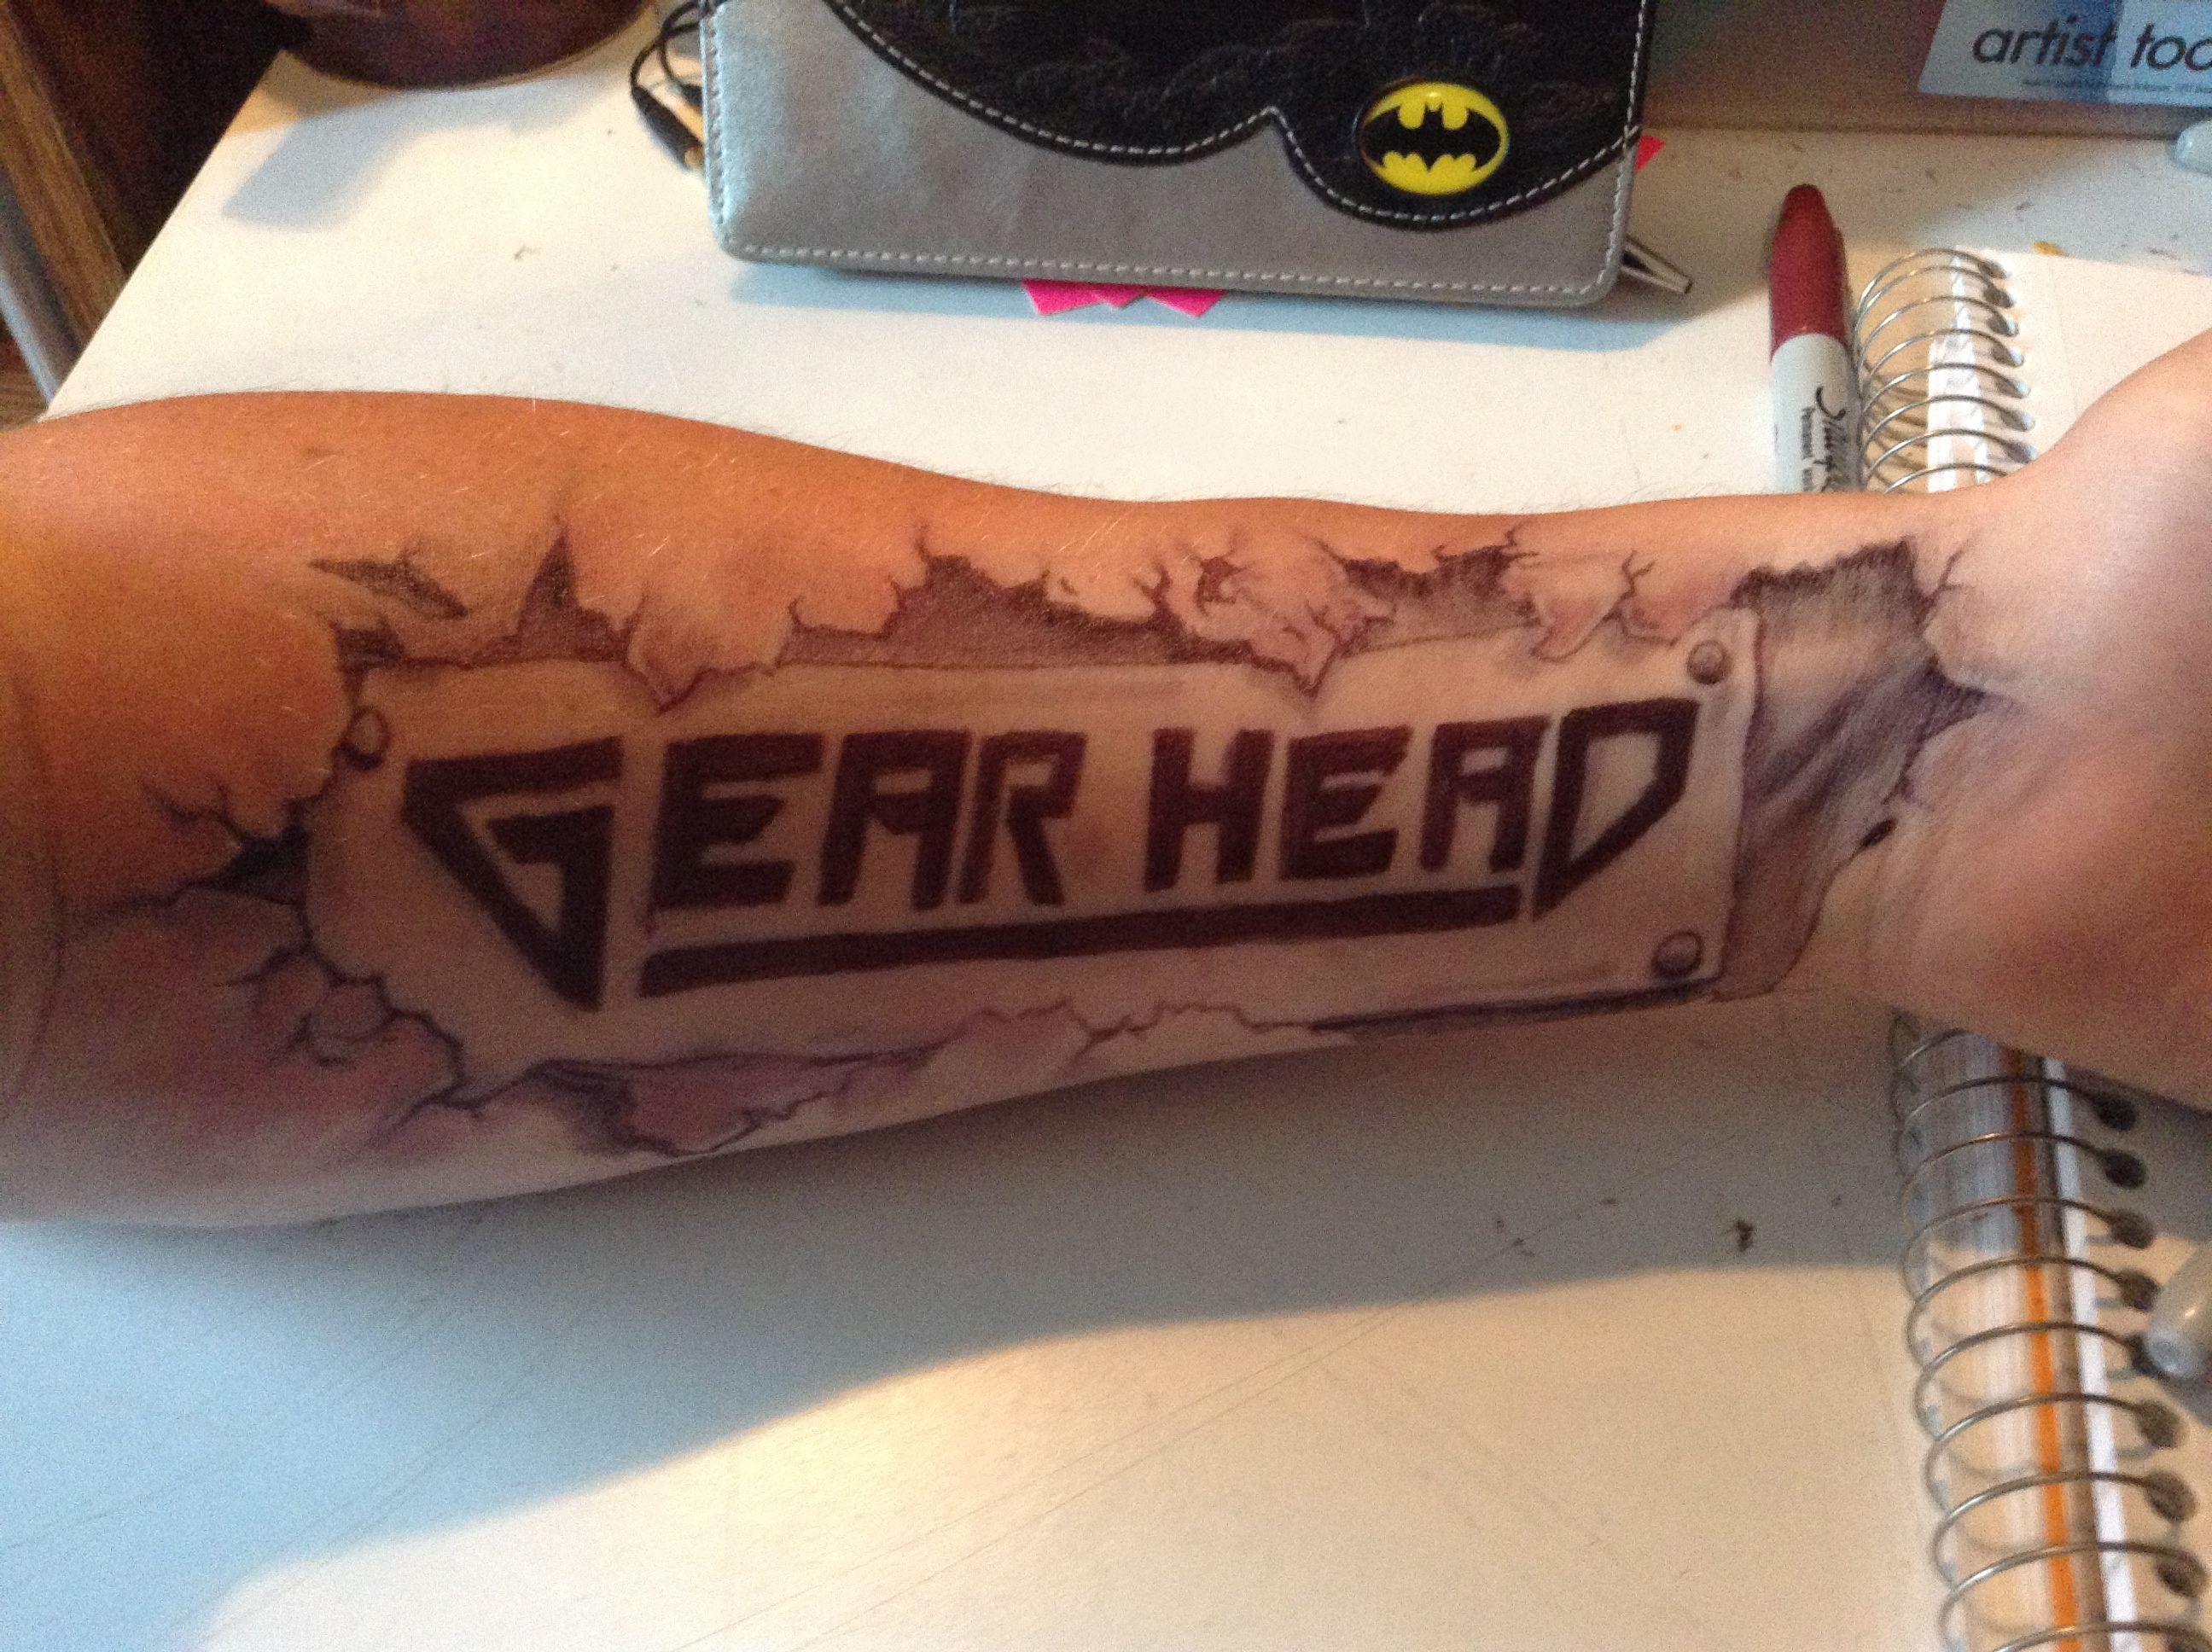 Photo of Gear head tattoo, drawn by Ryan Seufzer